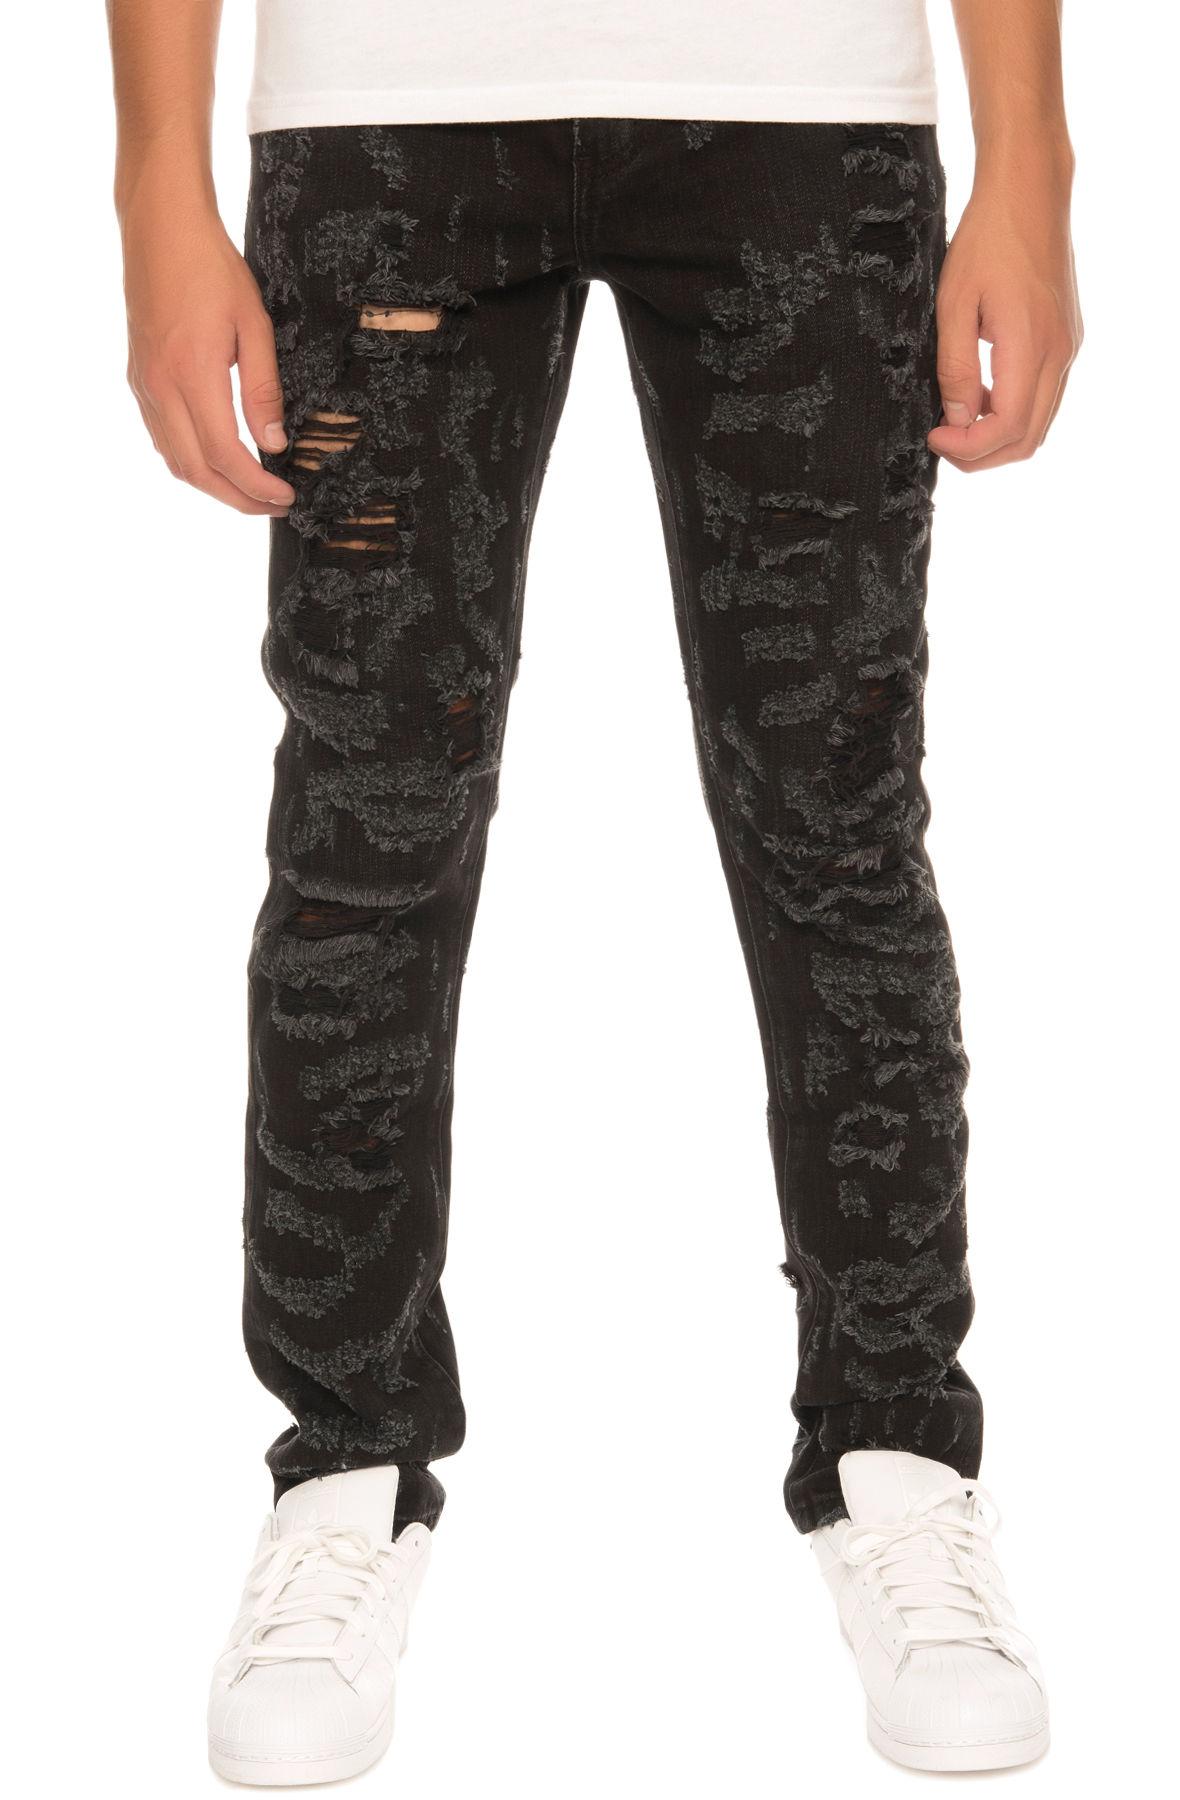 Image of The Erika Denim Jeans in Black